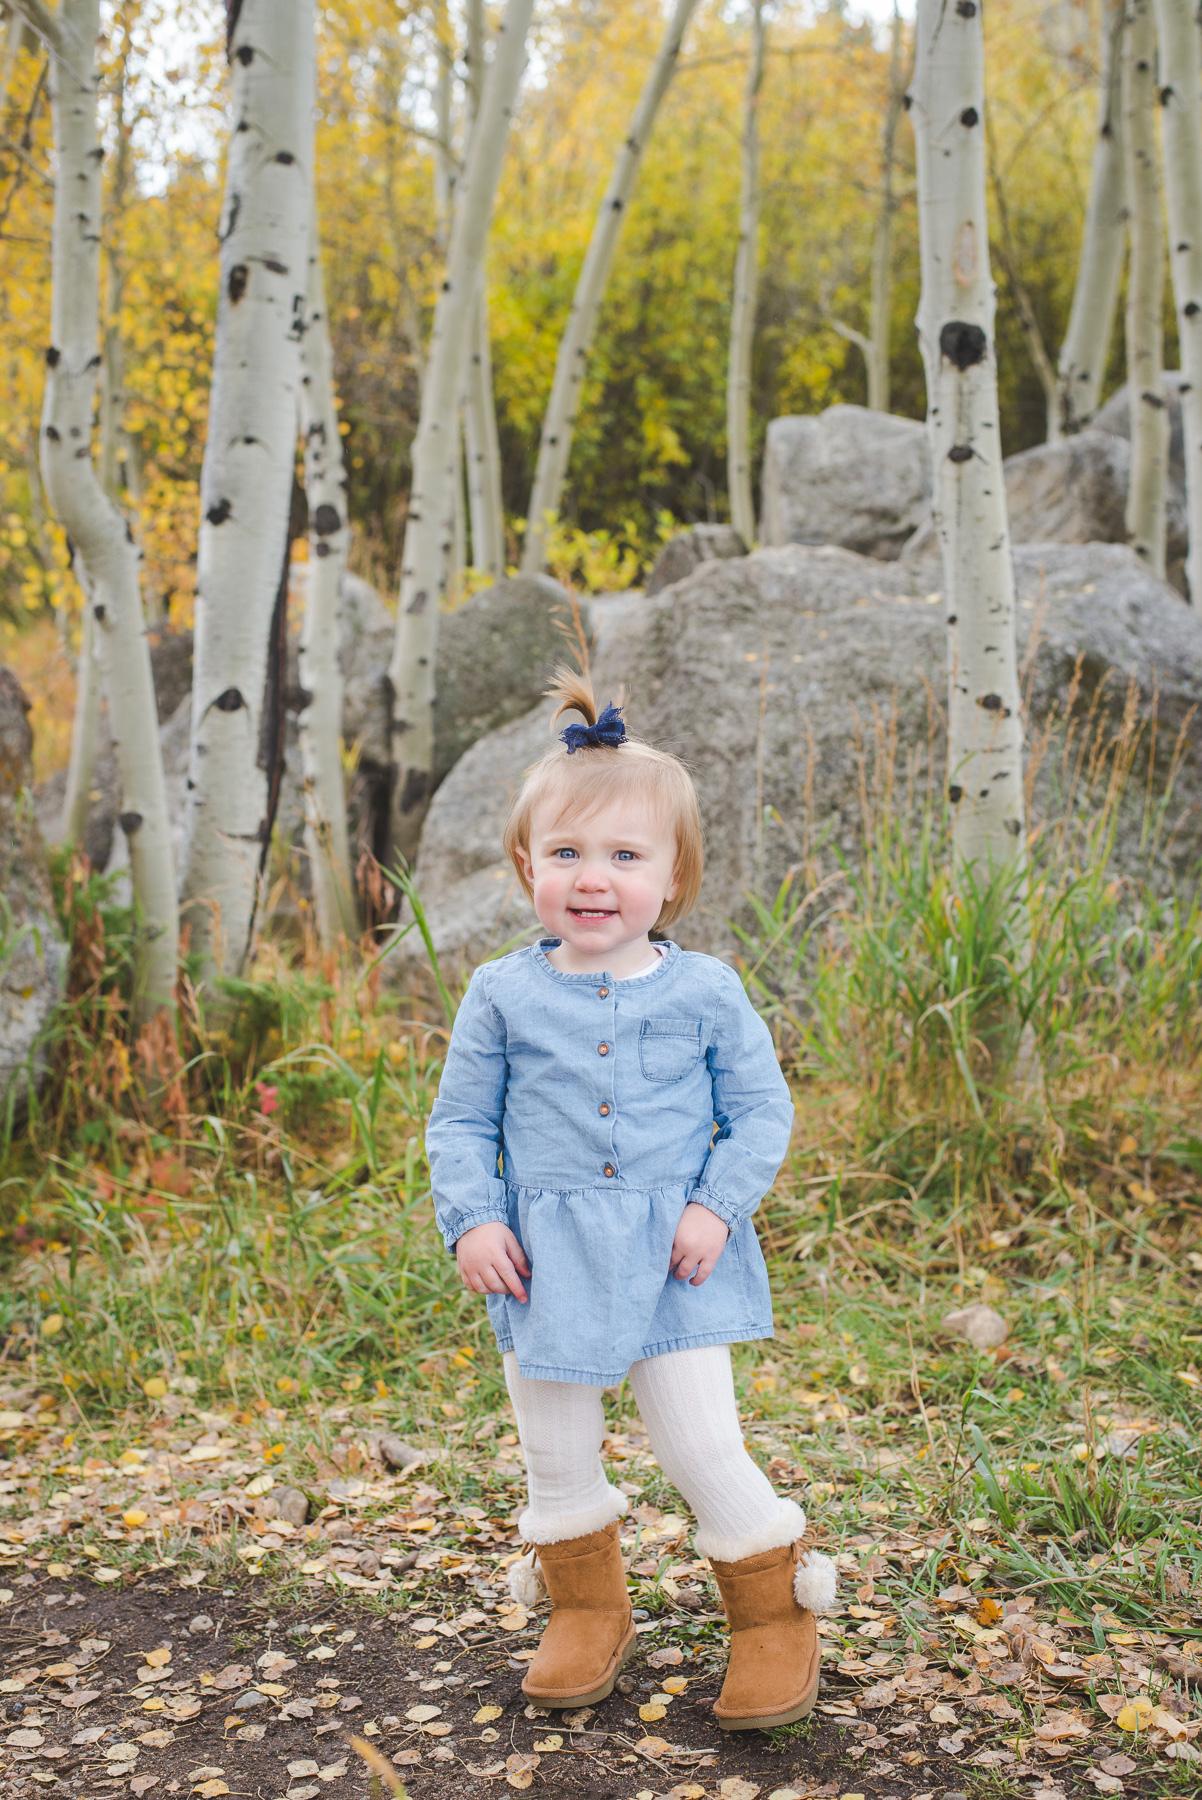 Autumn Family Portraits in the Mountains   Frisco, Colorado   Keeping Composure Photography   Colorado Family + Wedding Photographer